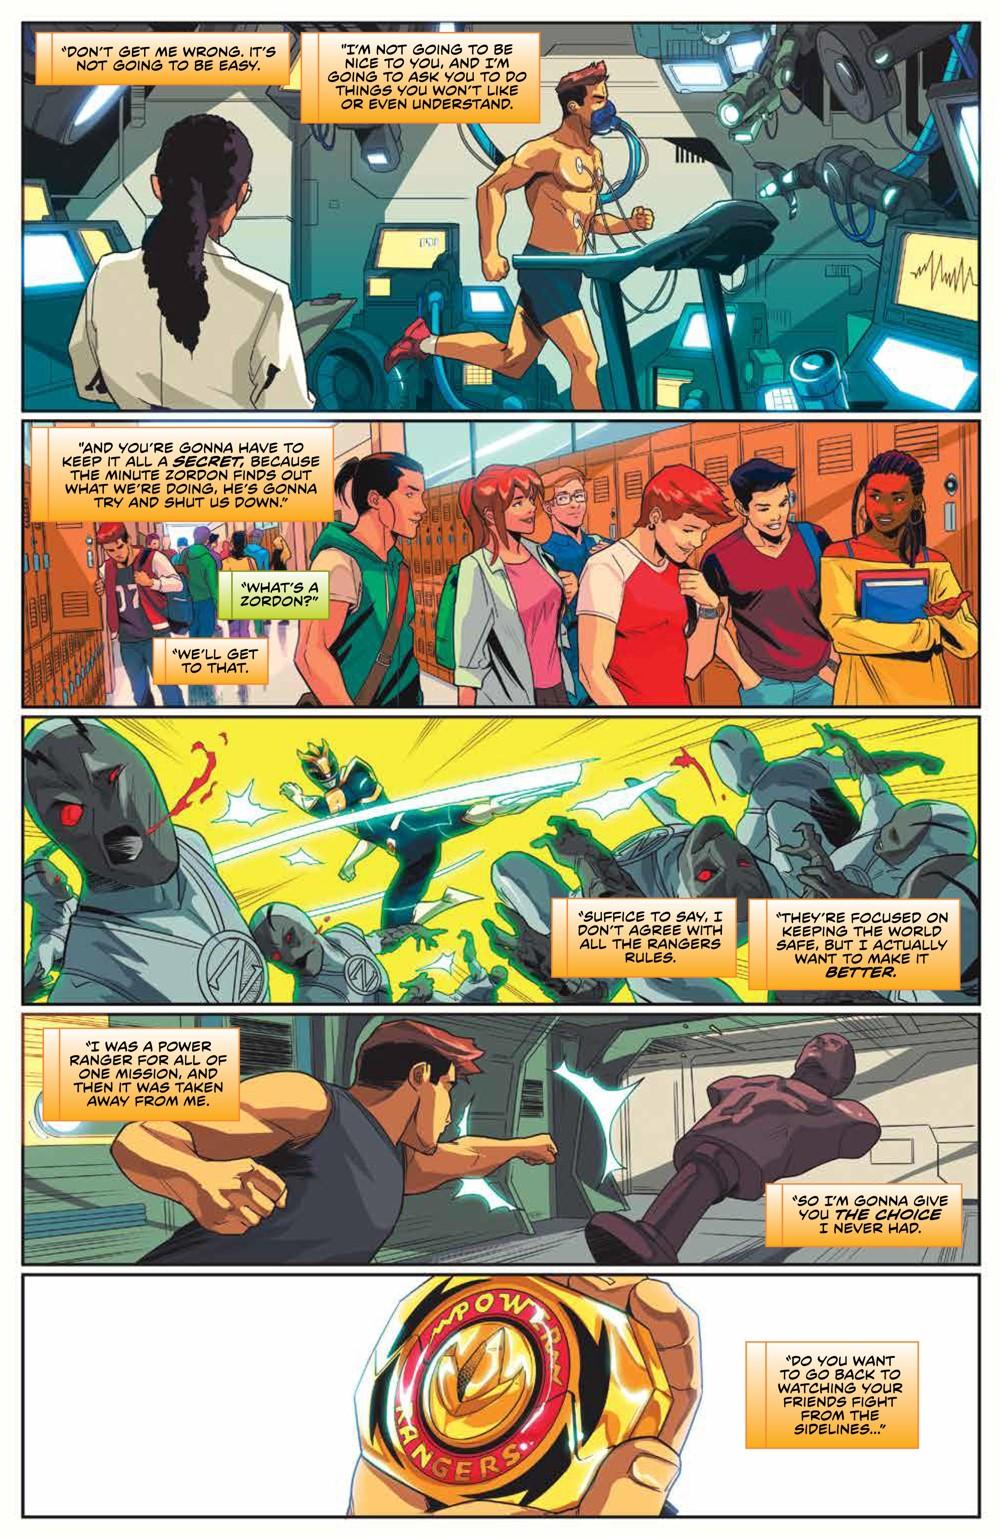 MightyMorphin_v2_SC_PRESS_15 ComicList Previews: MIGHTY MORPHIN VOLUME 2 TP